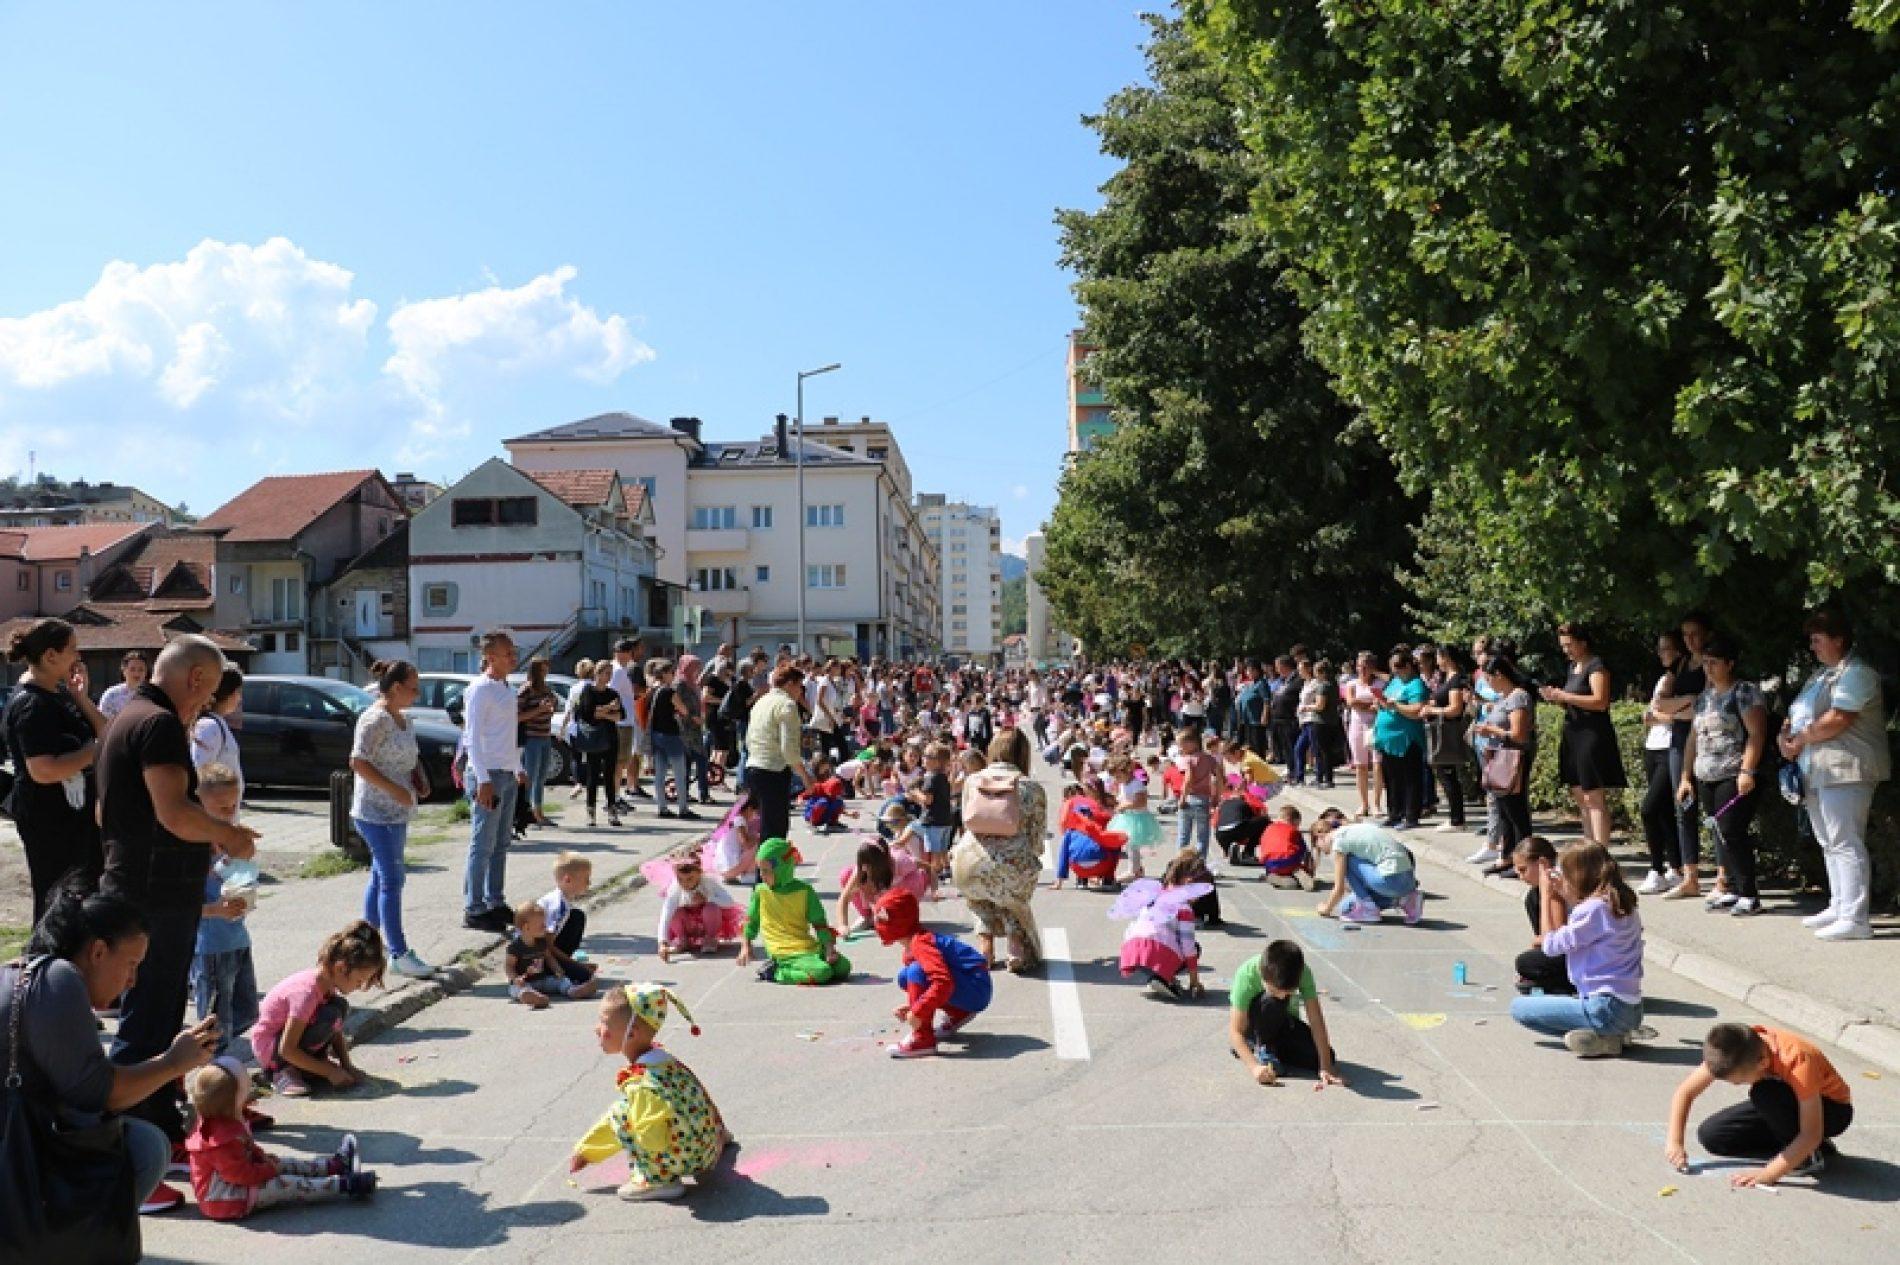 Obilježen 10. septembar, Dan općine Banovići